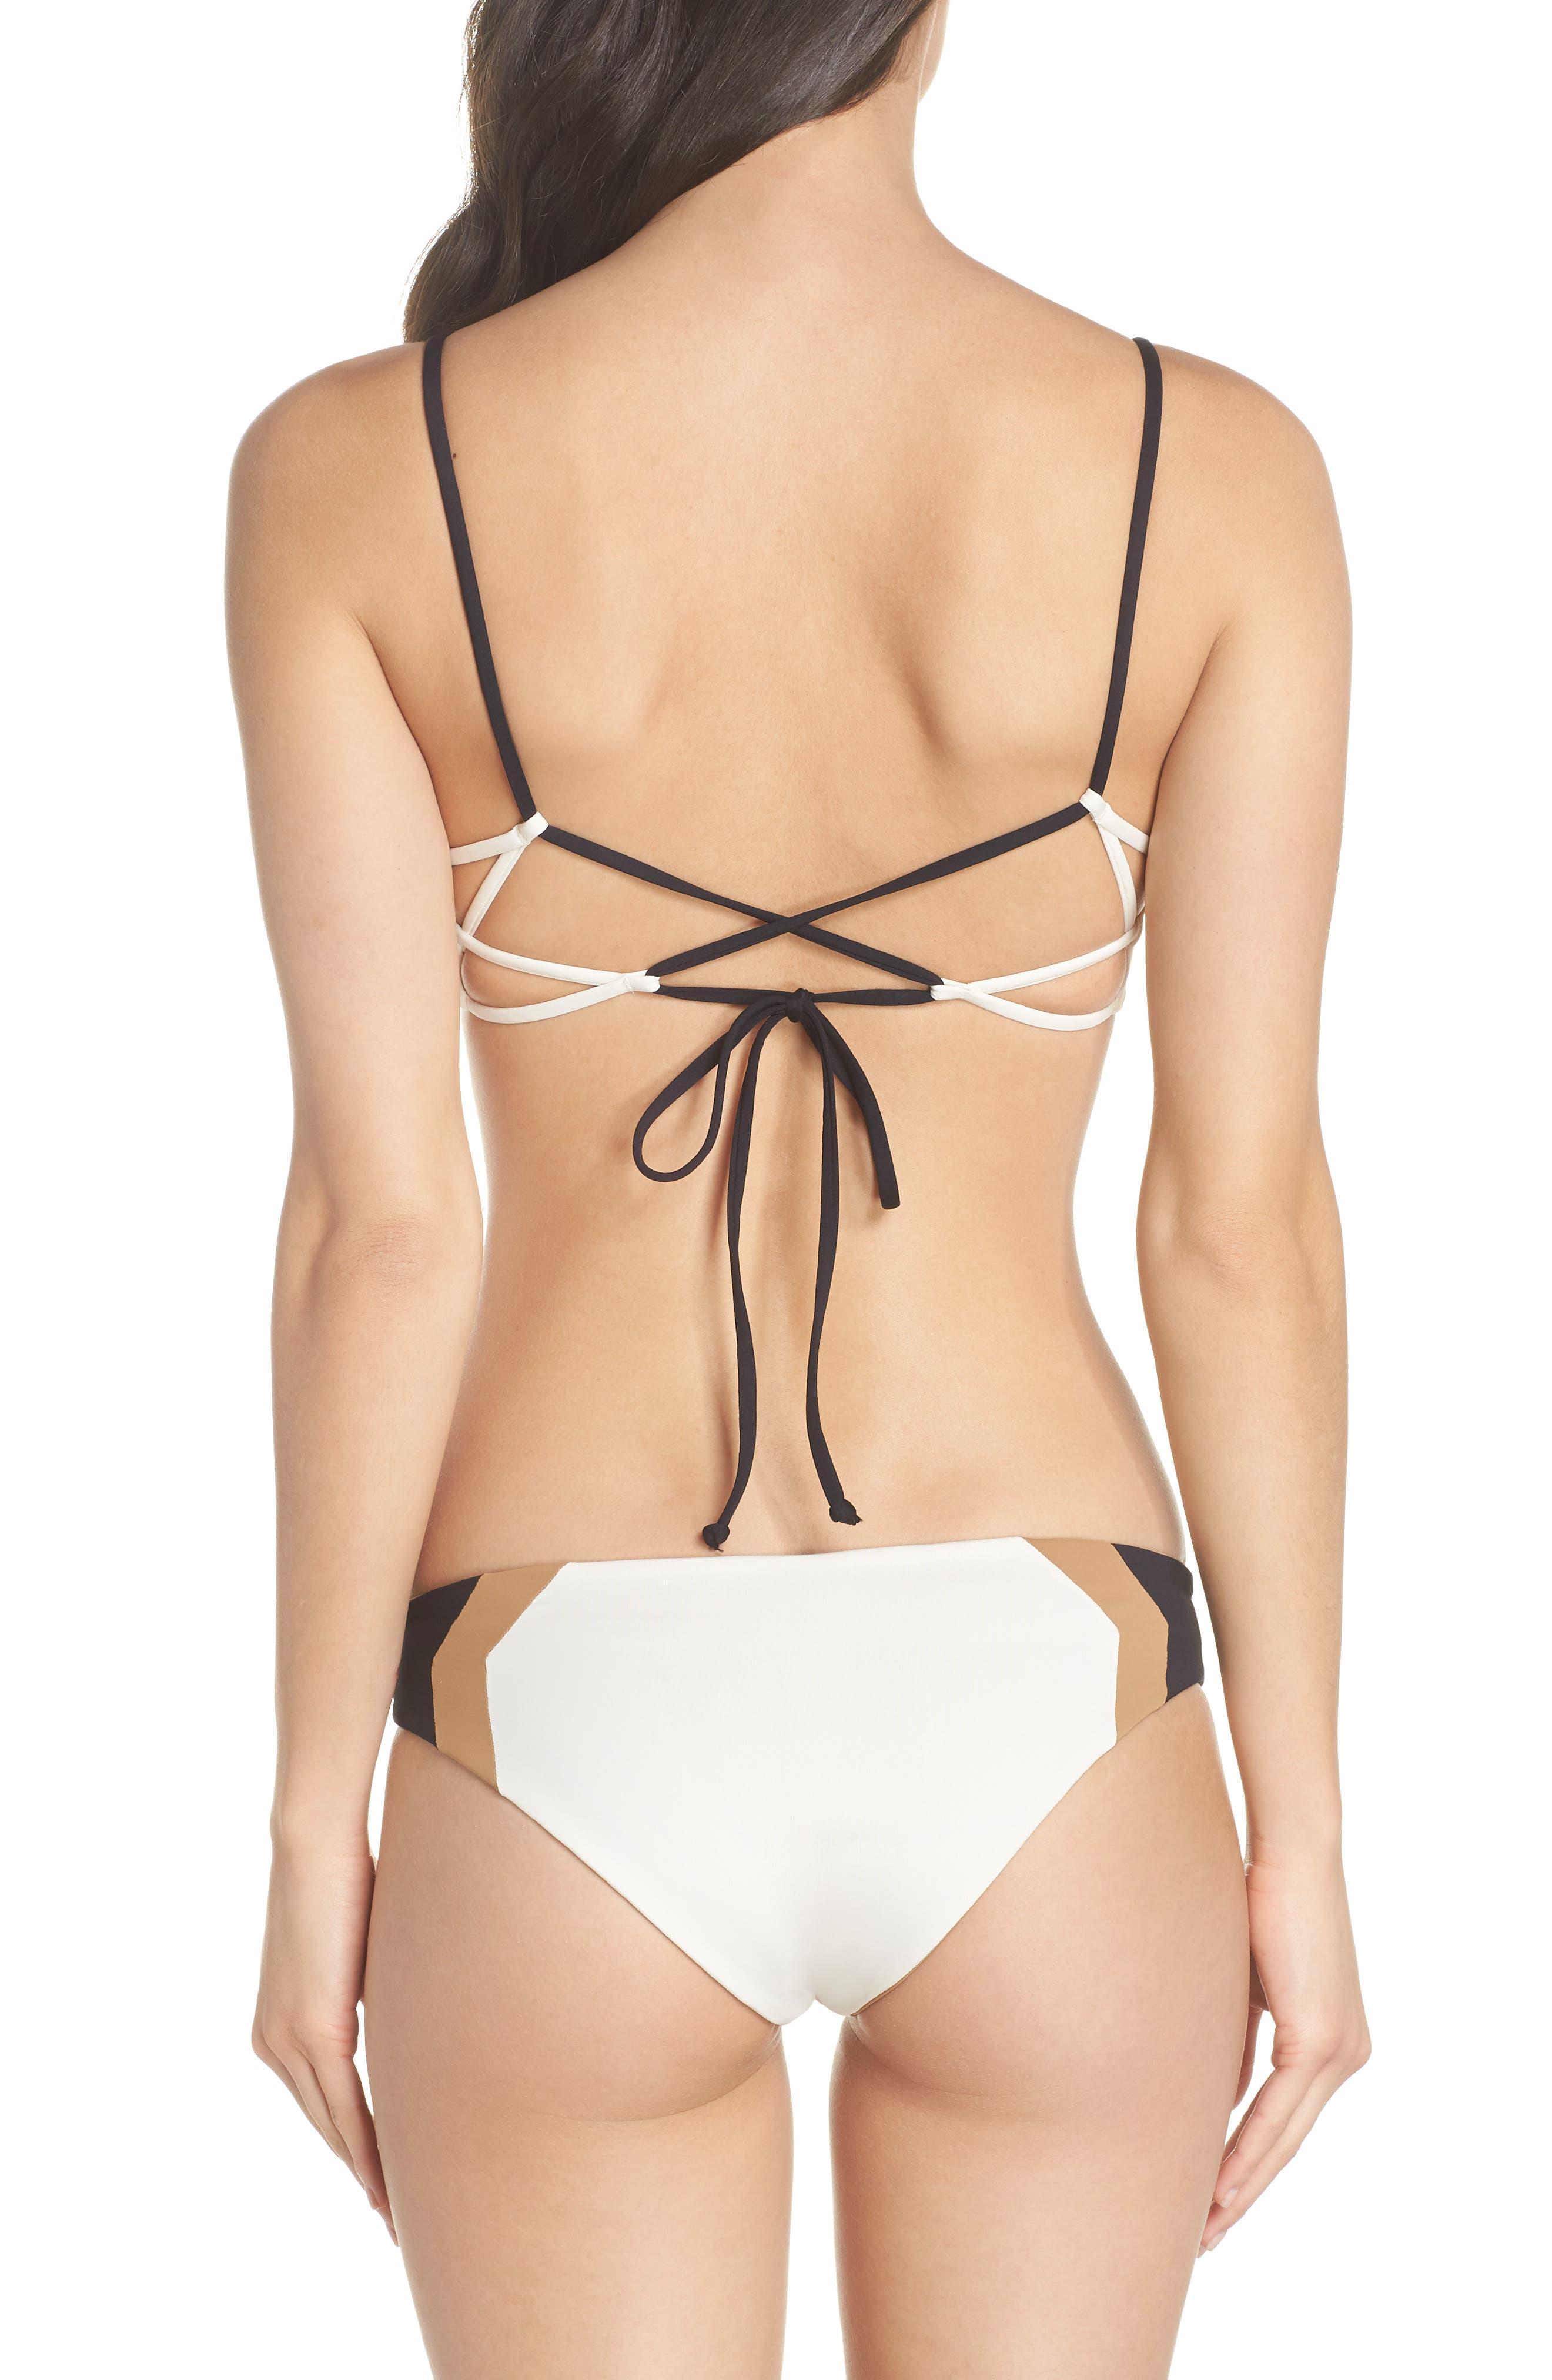 Baracuda Reversible Classic Hipster Bikini Bottoms,                             Alternate thumbnail 8, color,                             Cream/ Black/ Camel